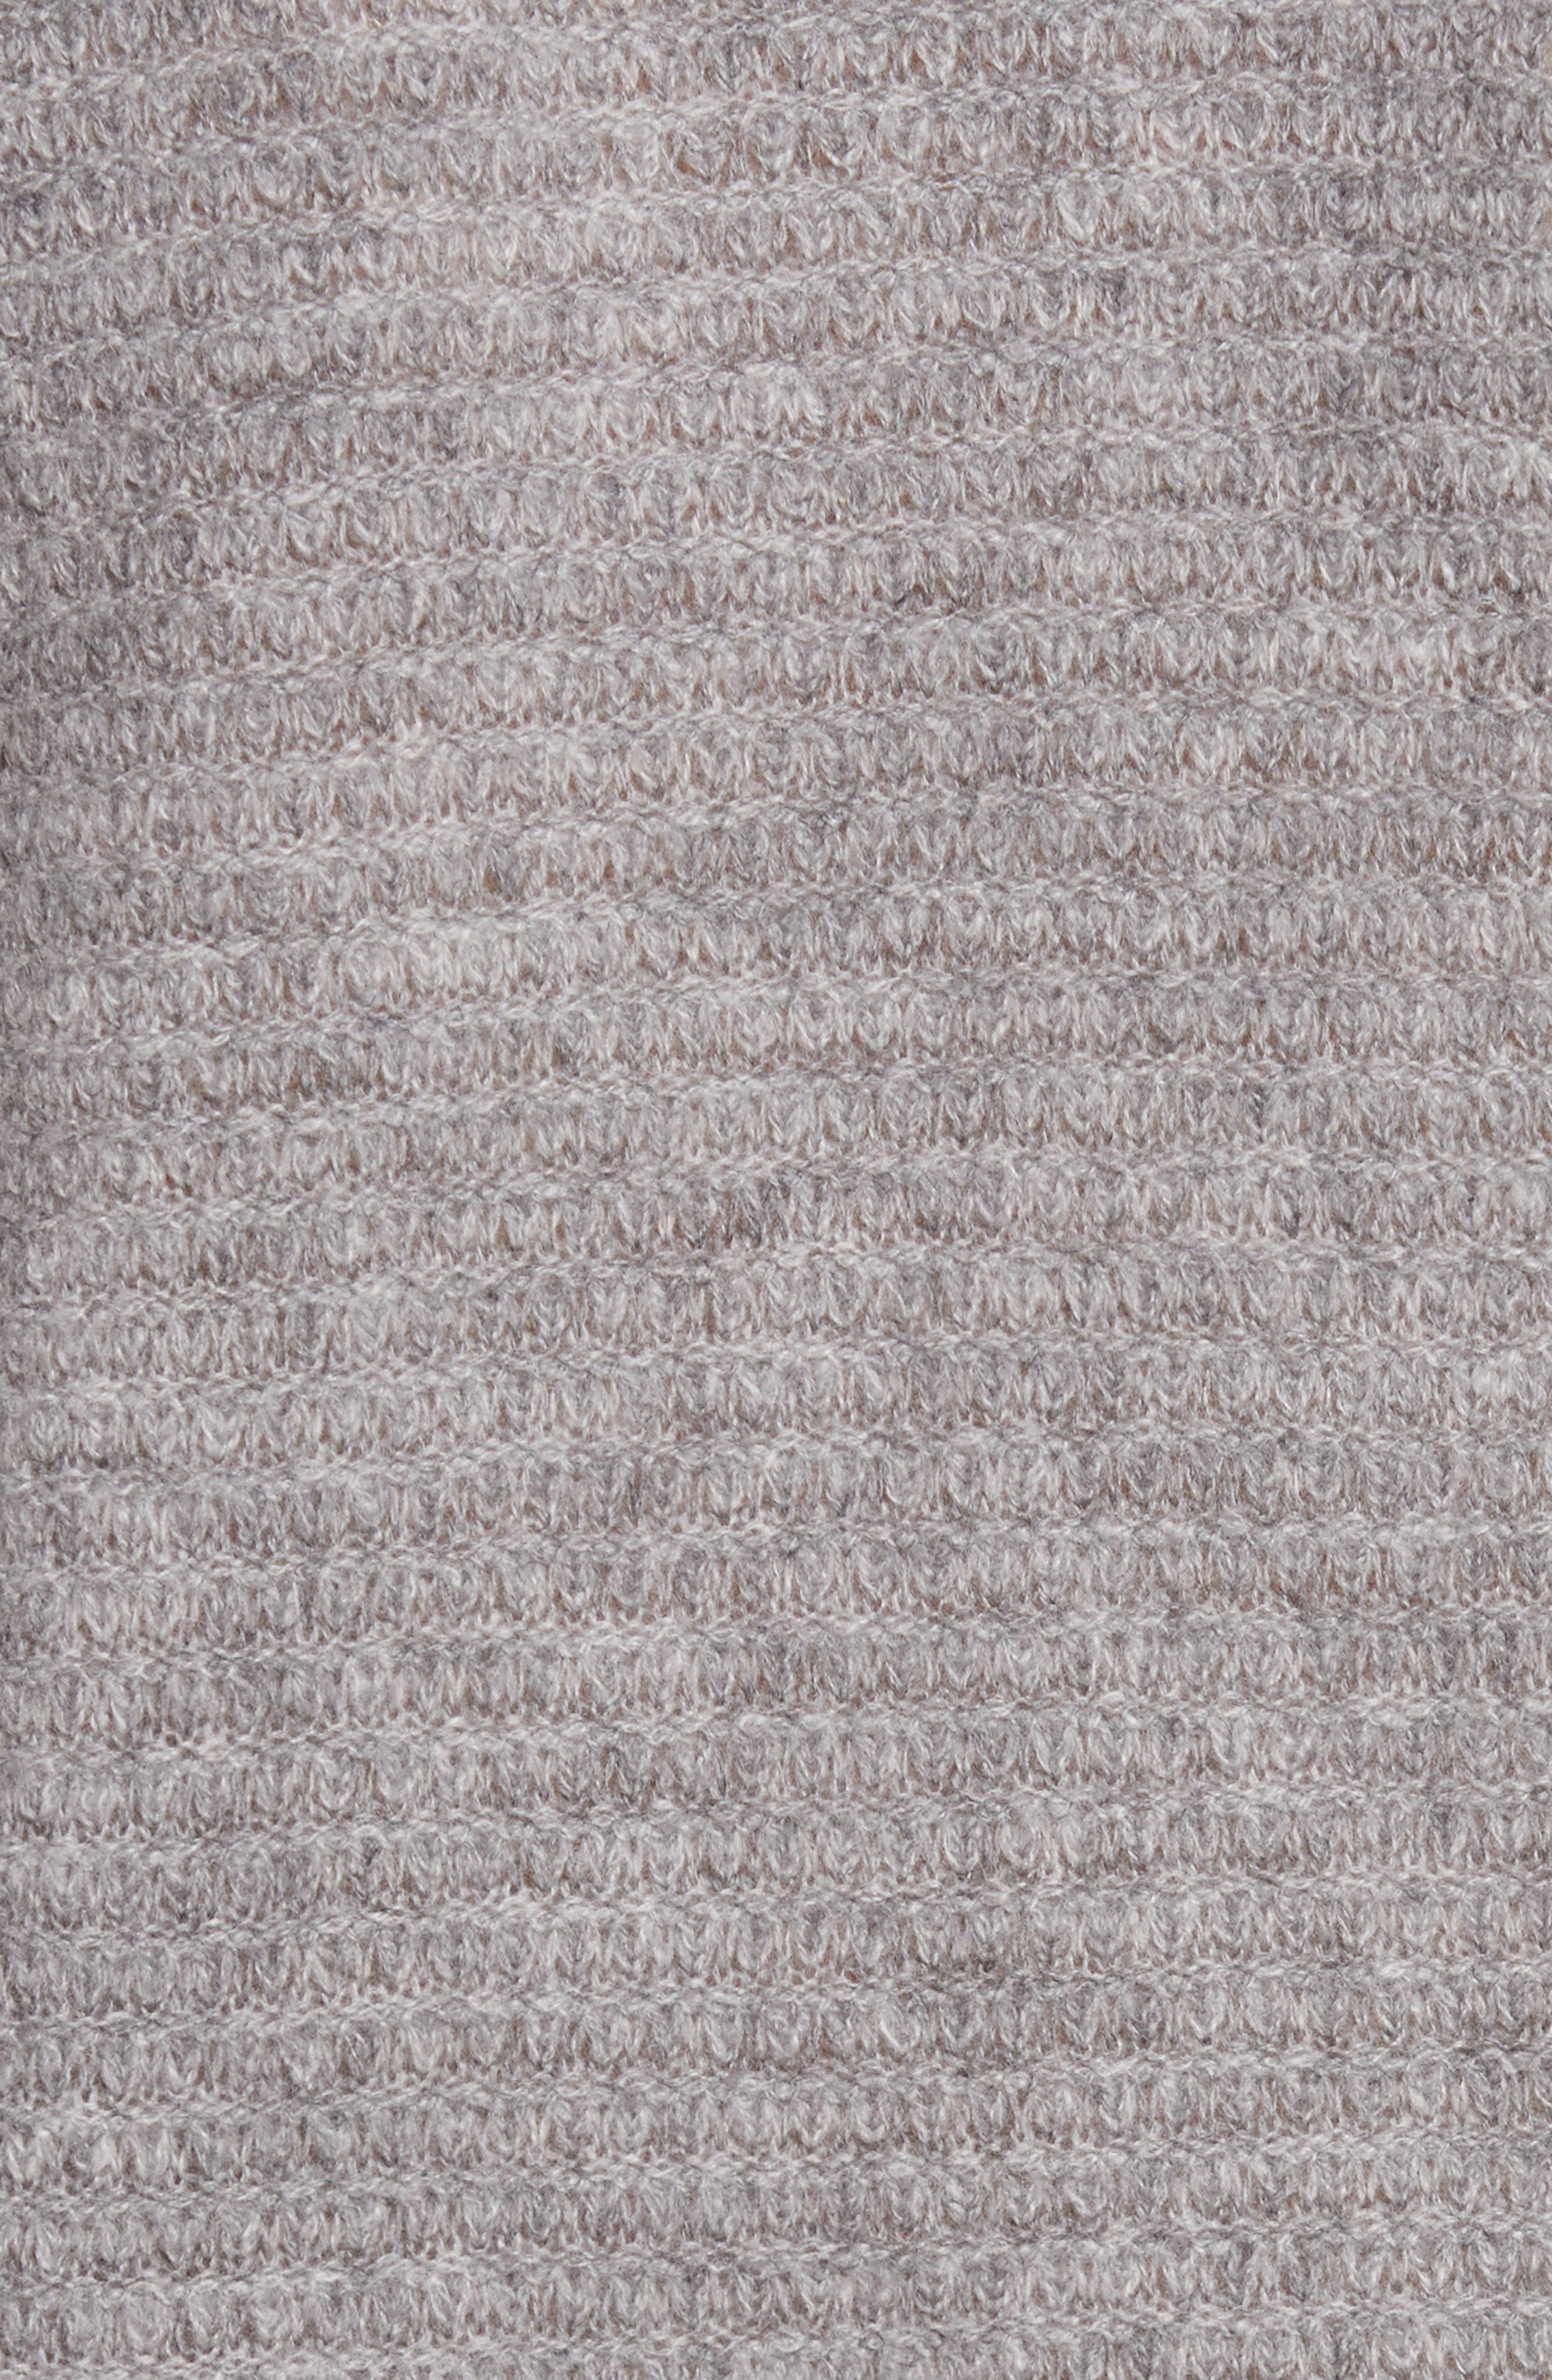 Cashmere V-Neck Sweater,                             Alternate thumbnail 5, color,